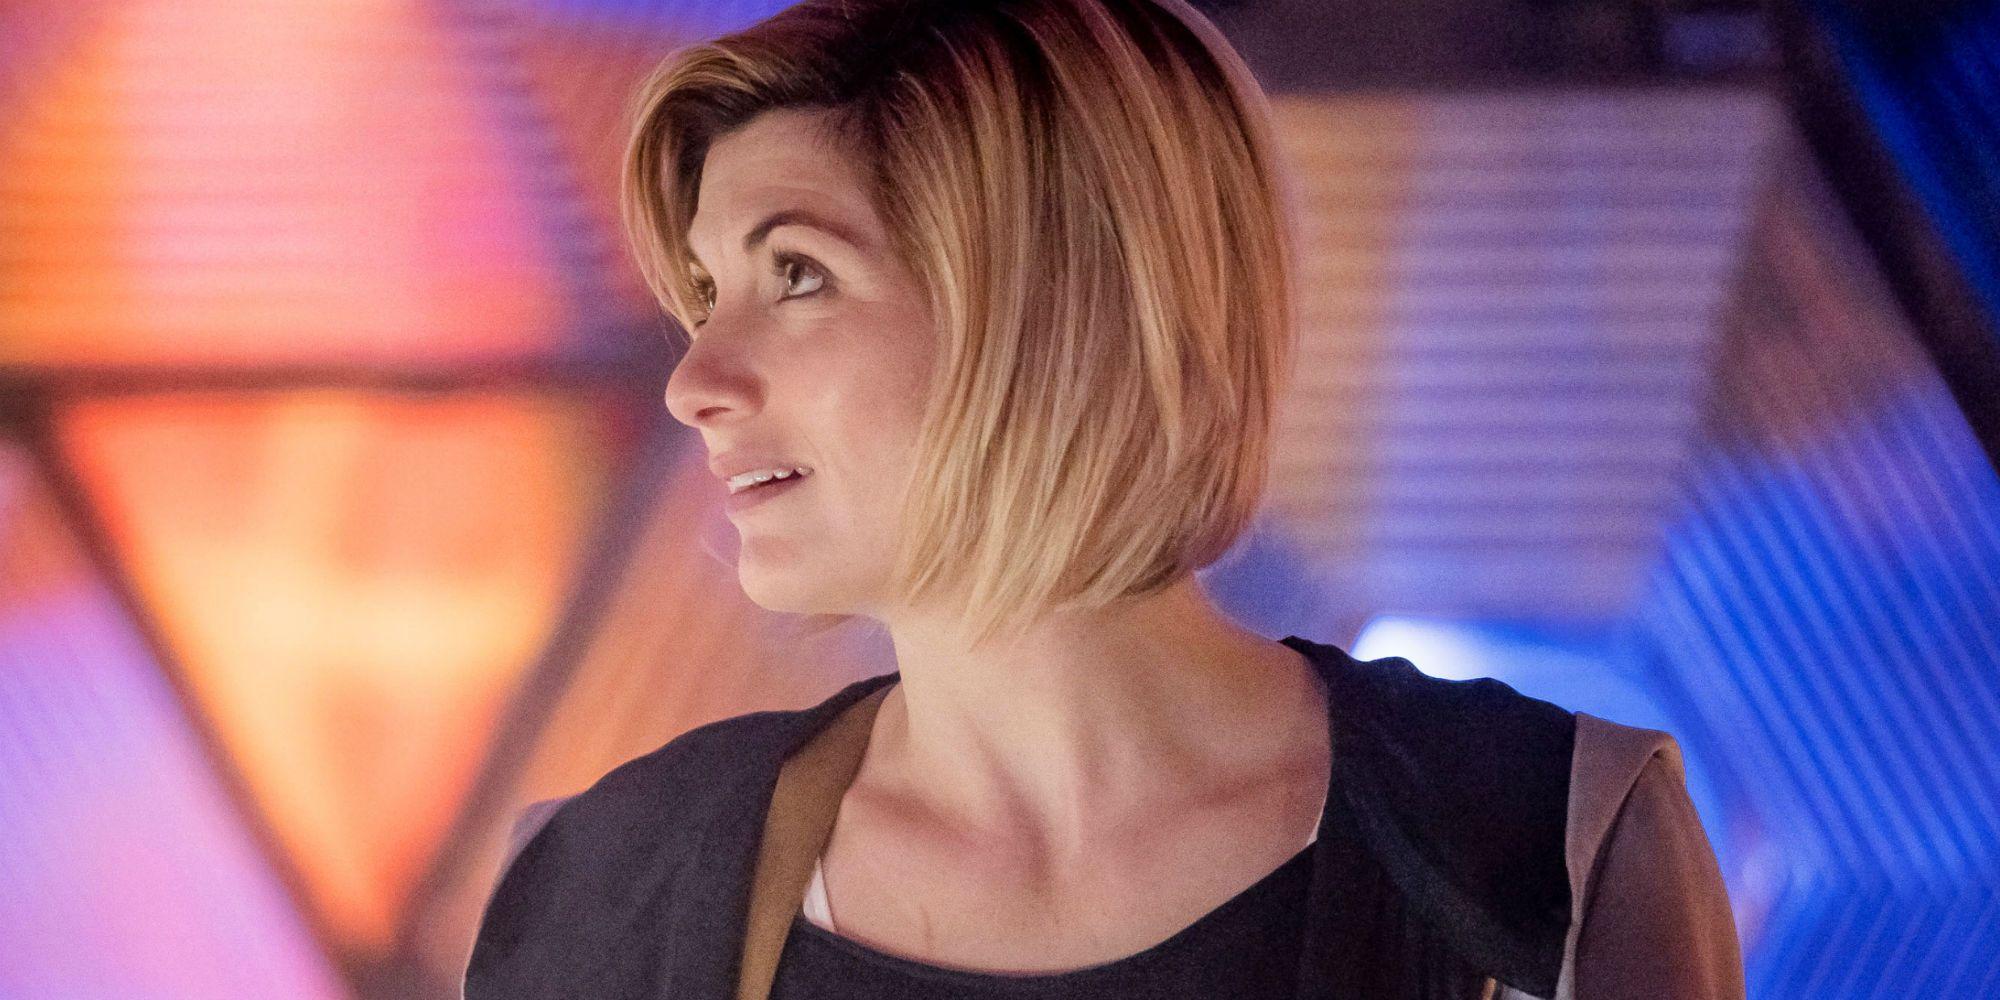 Doctor Who's Jodie Whittaker Confirms Next Season Return